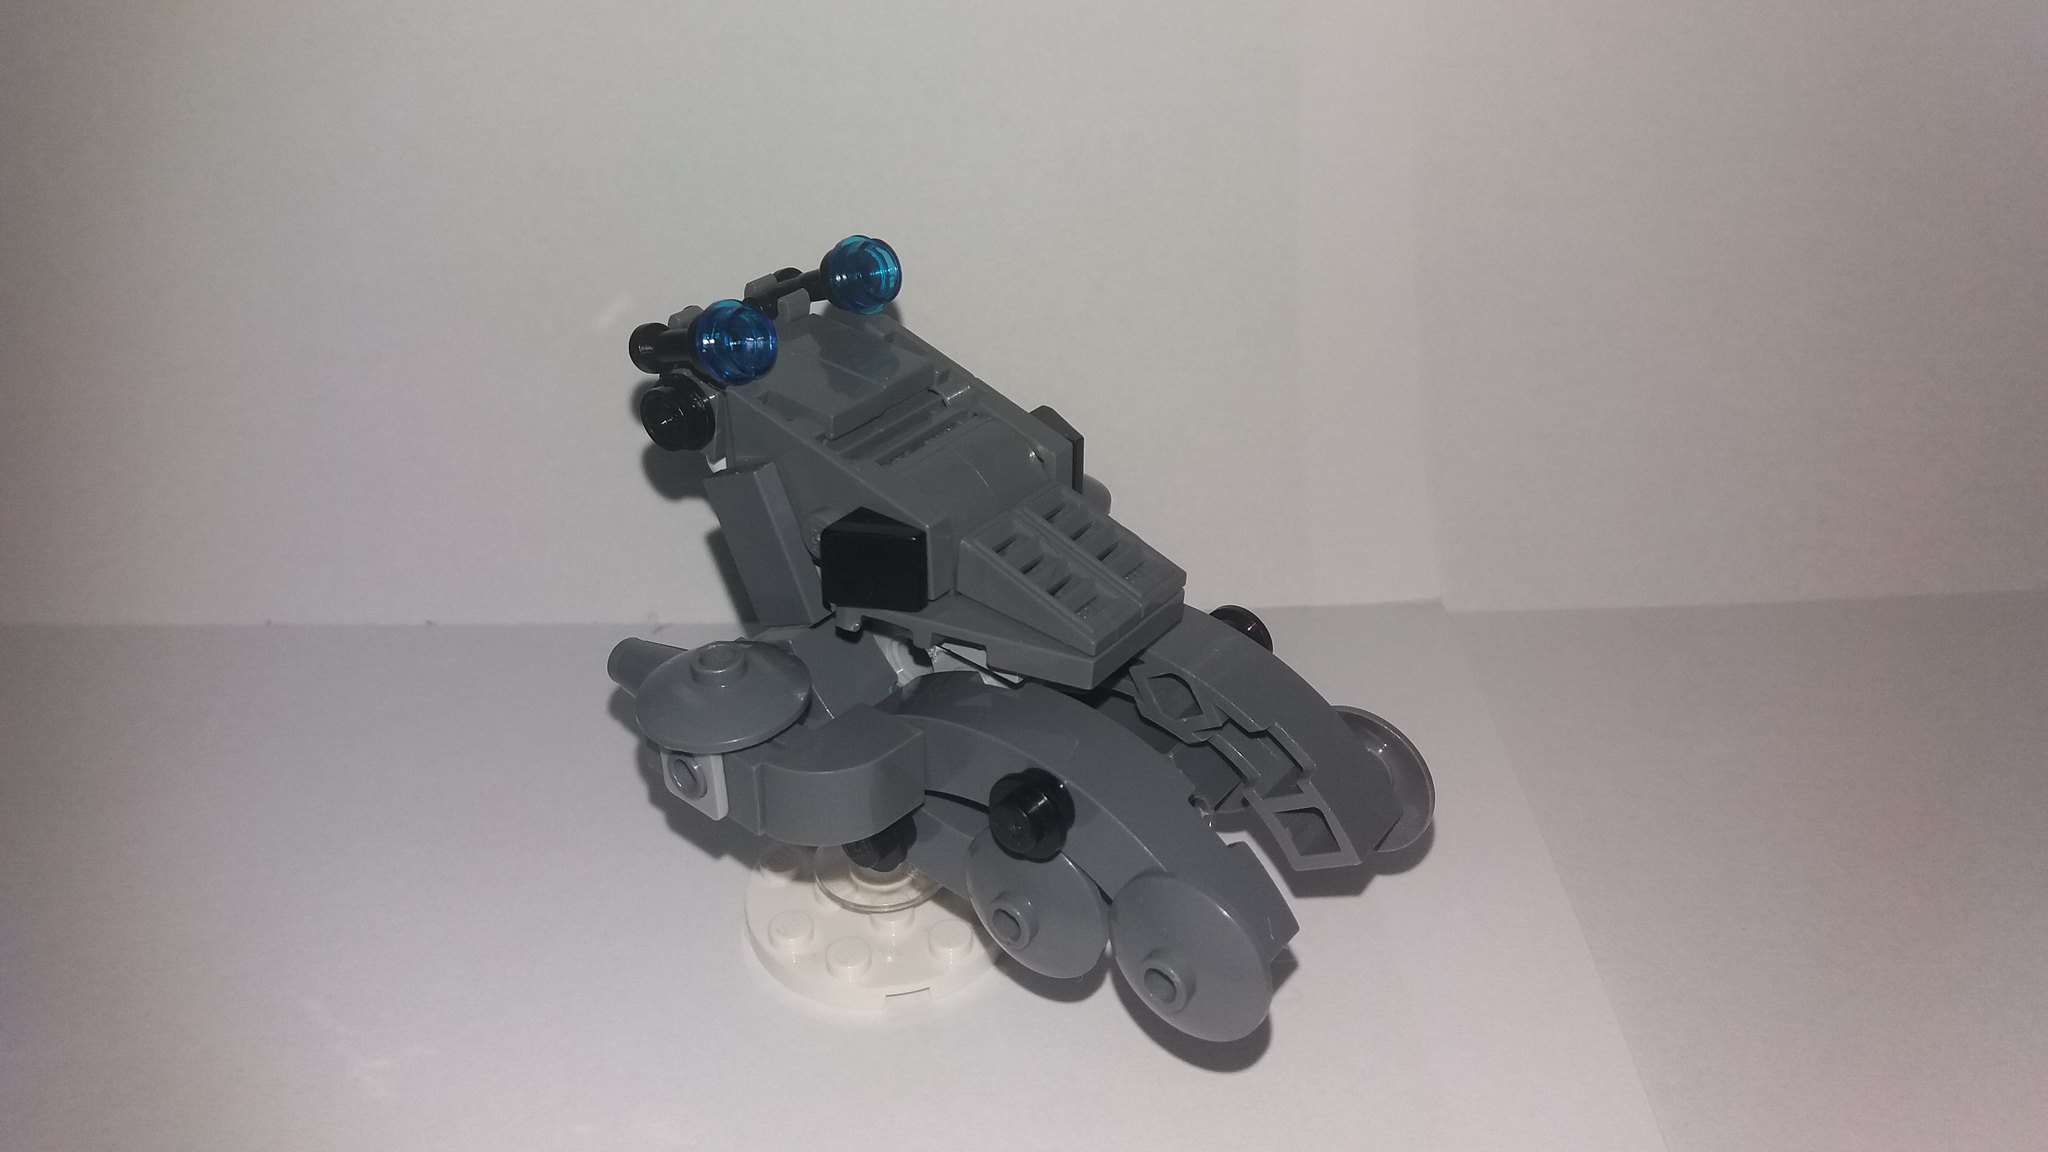 Alien scout ship